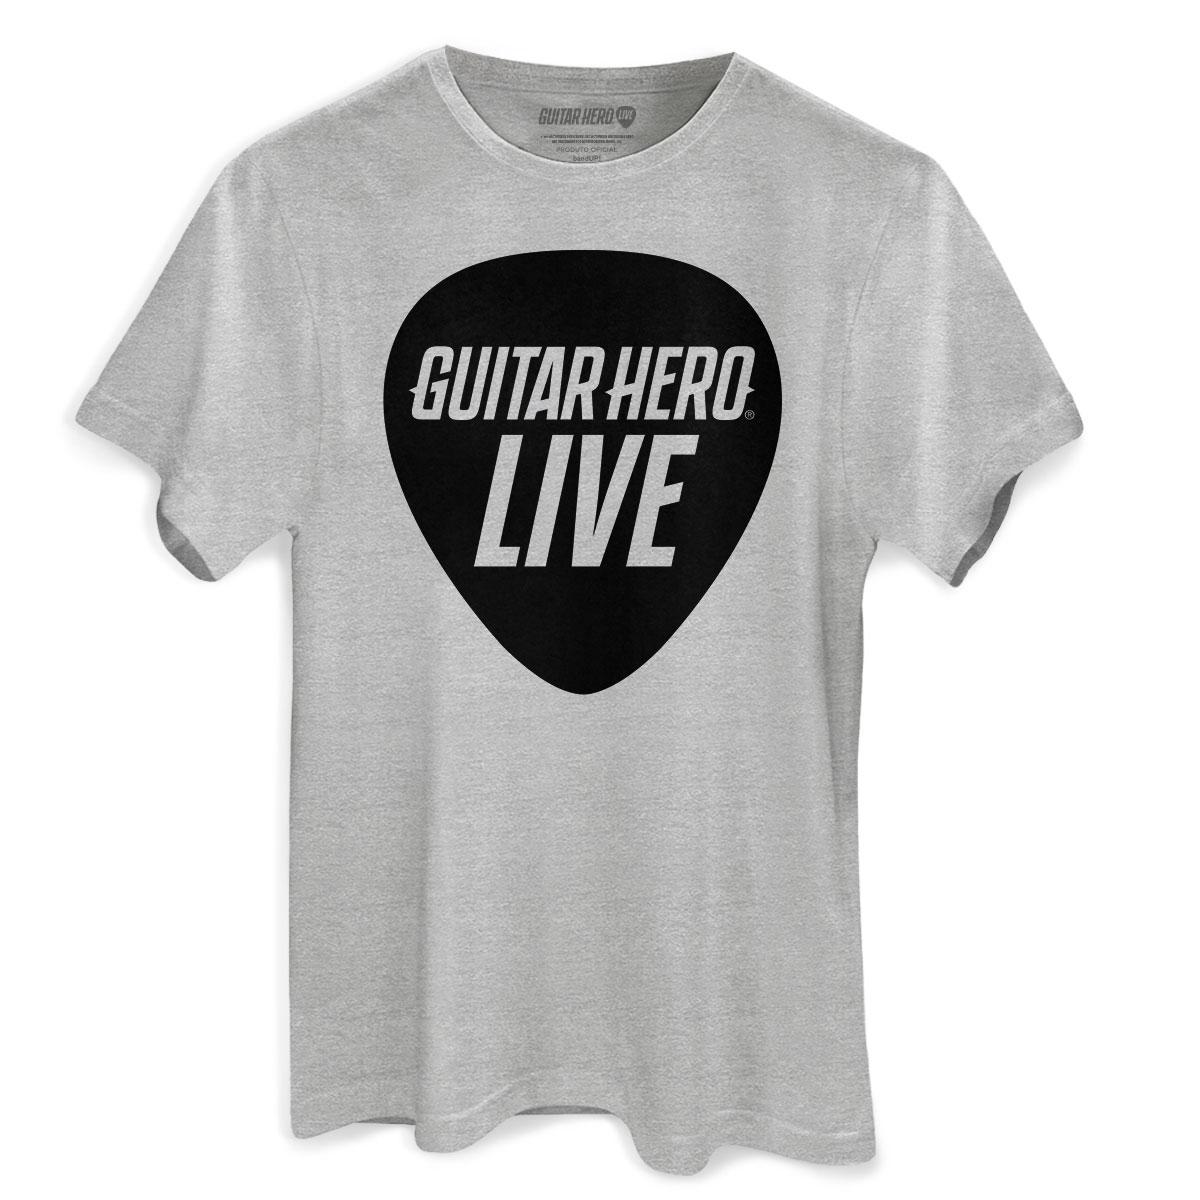 Camiseta Masculina Guitar Hero Palheta 2